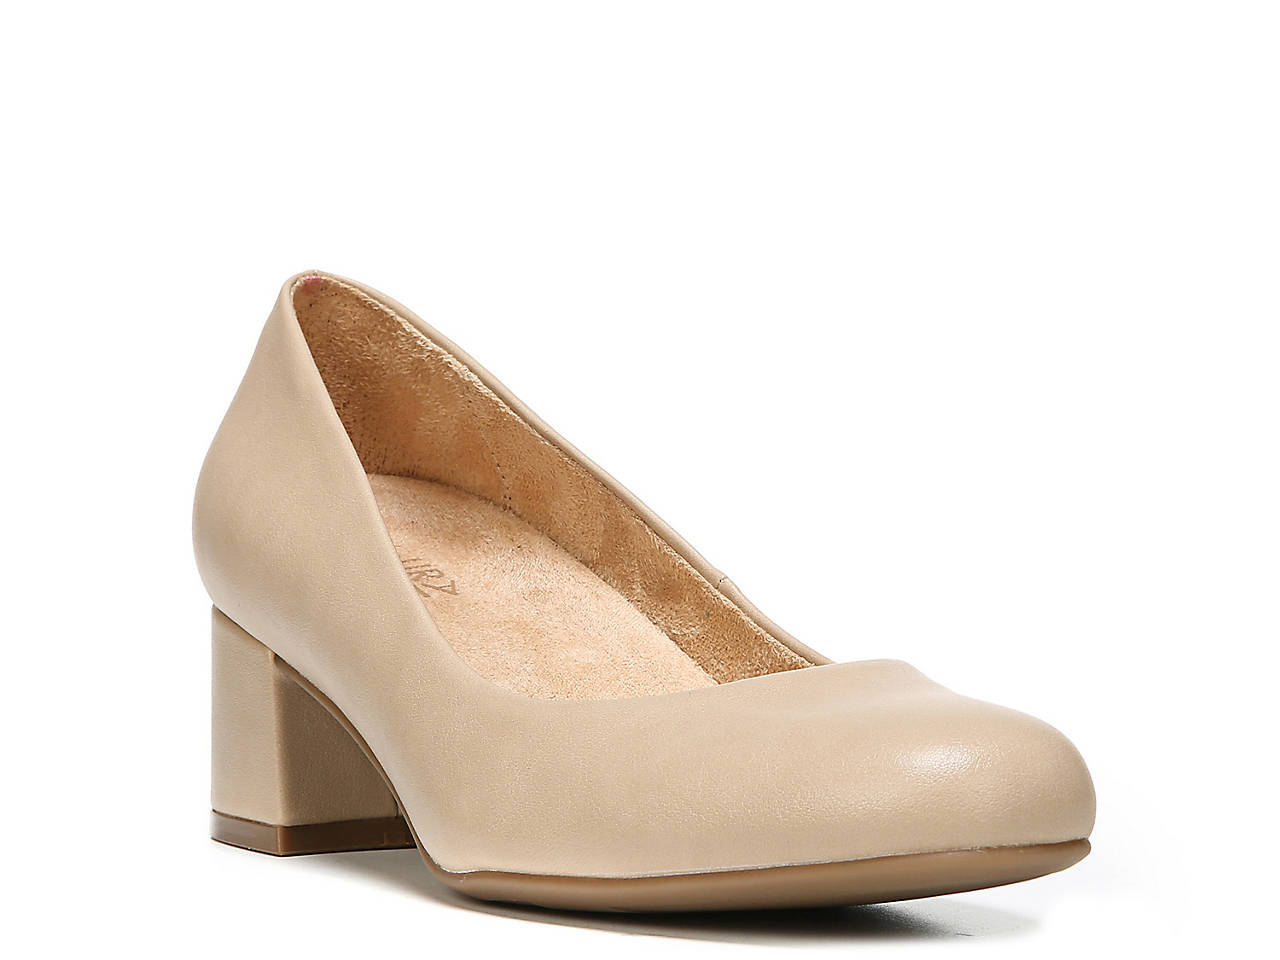 cd40139ad537 Naturalizer Donelle Pump Women s Shoes